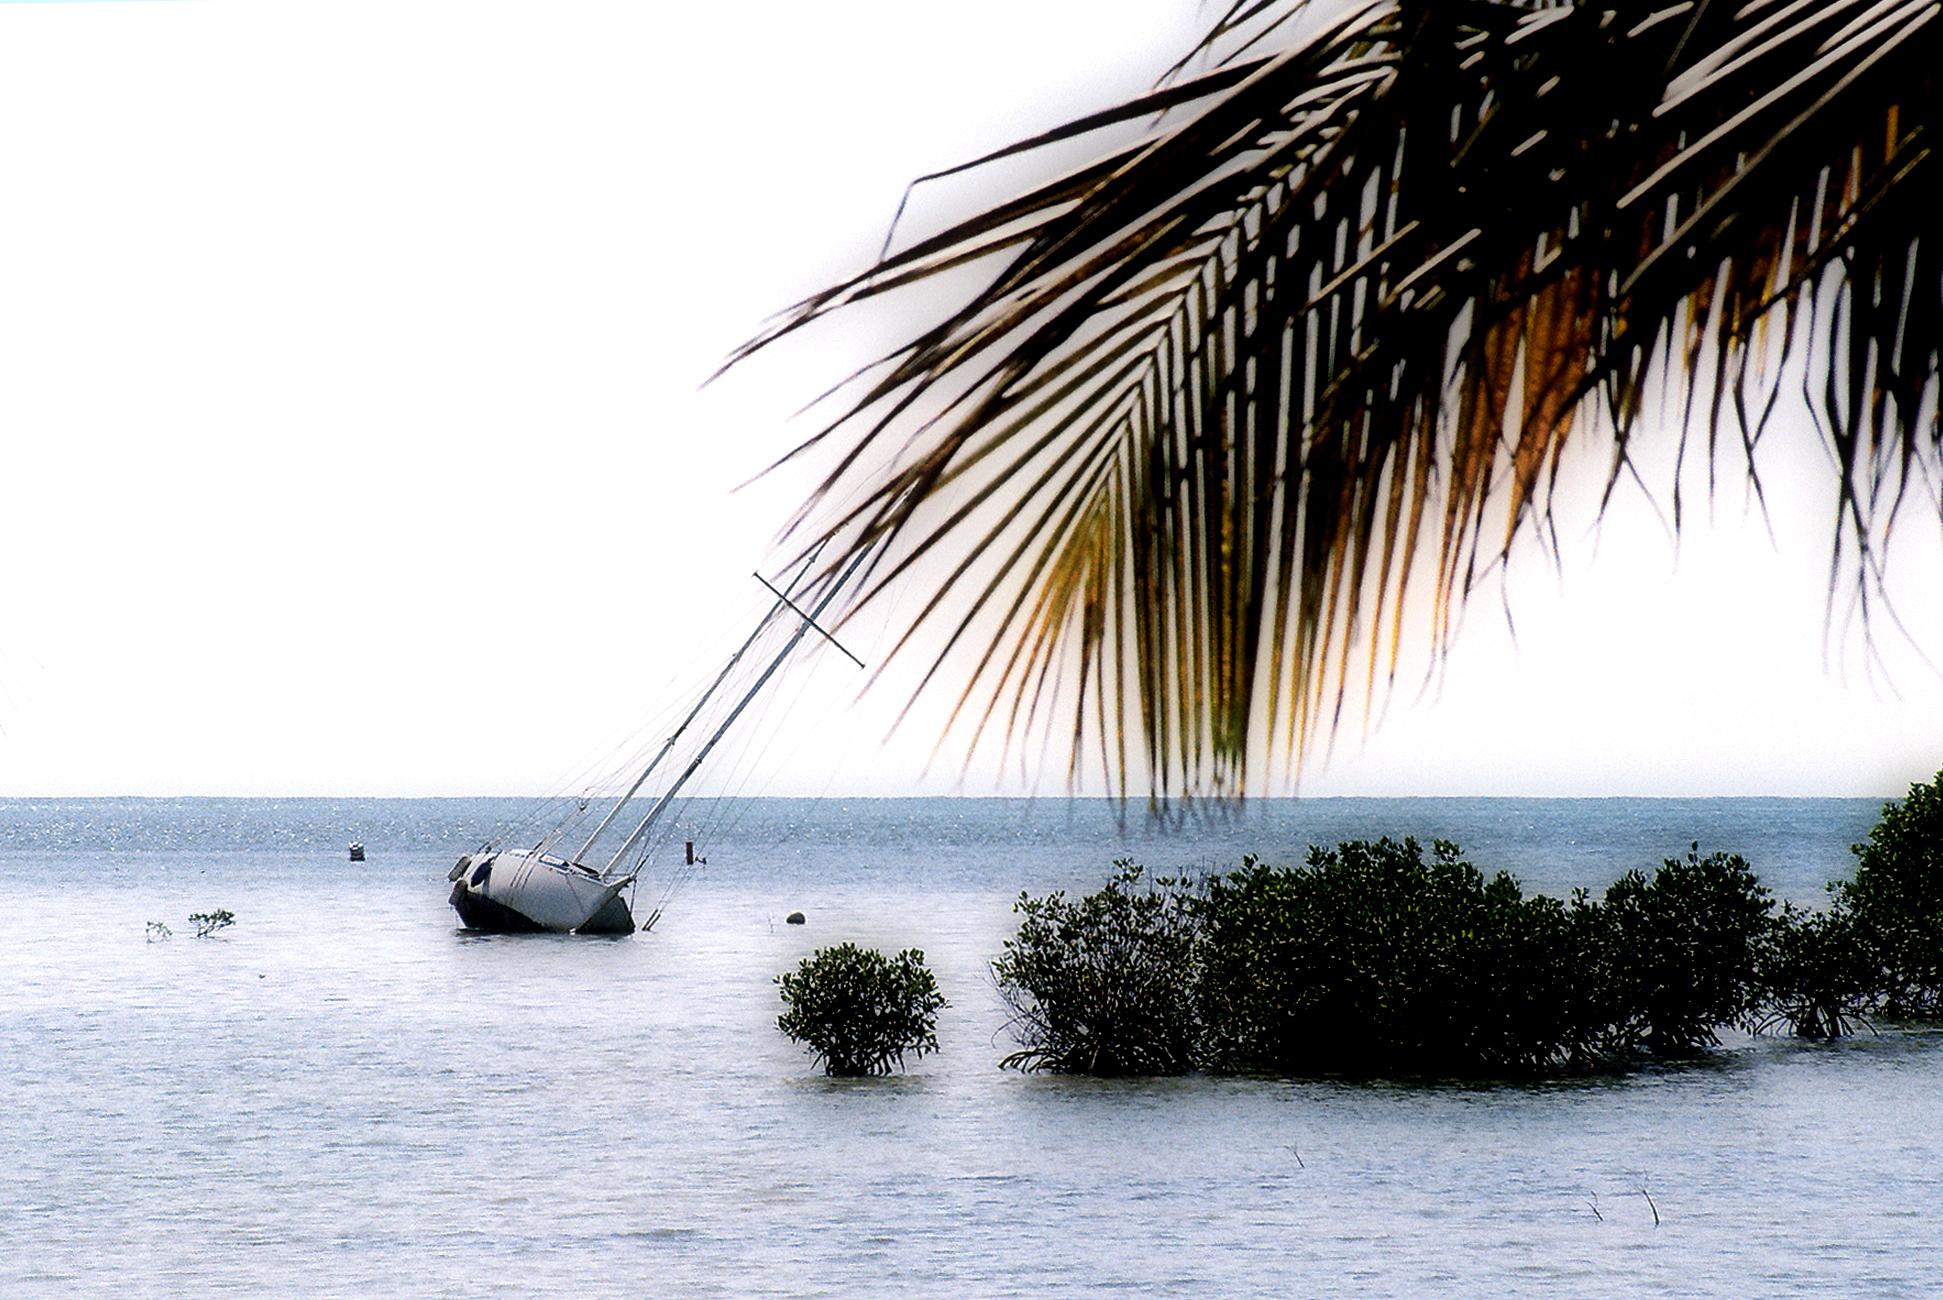 Trouble at the sandbar, Listing, Mangroves, Ocean, Sailboat, HQ Photo